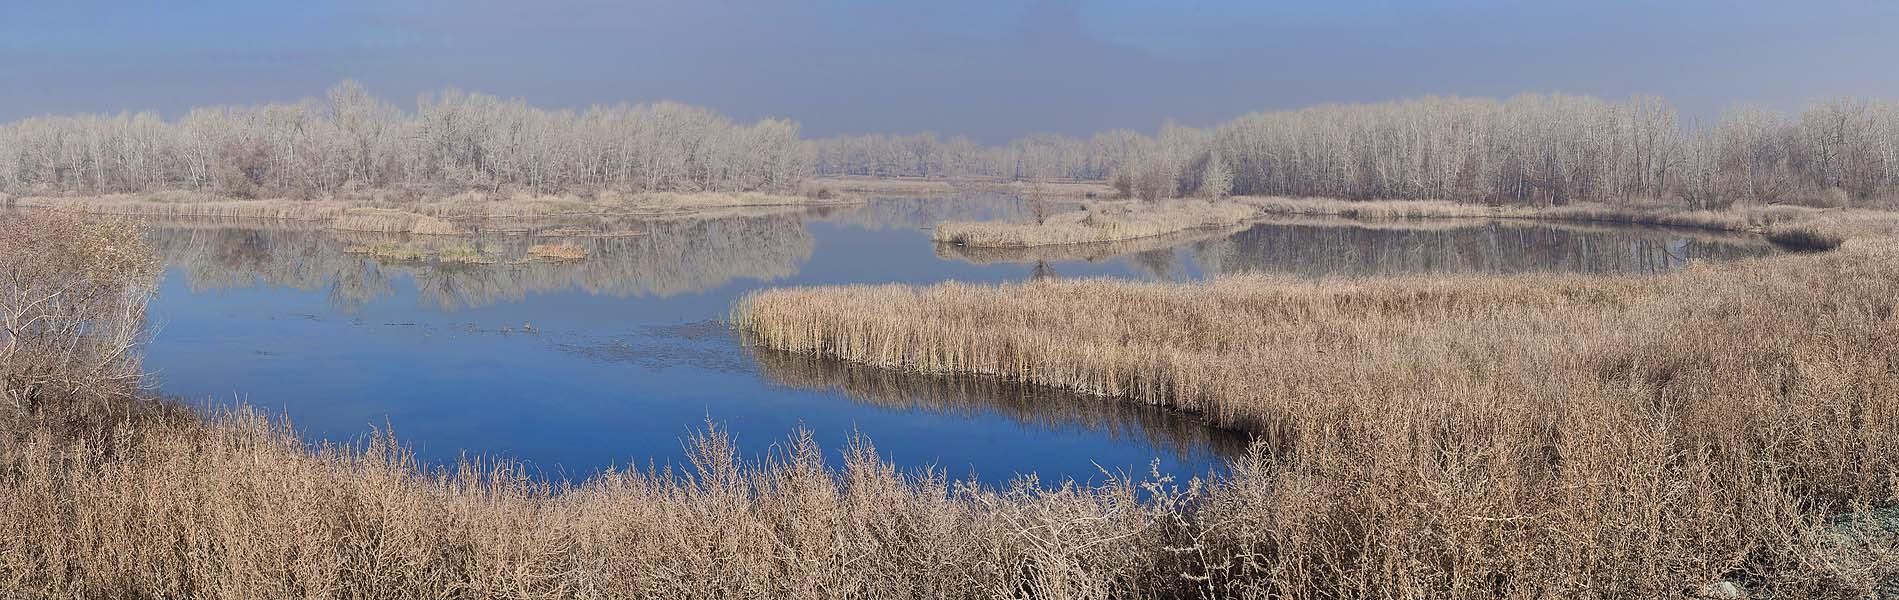 панорама,р.урал, Качурин Алексей